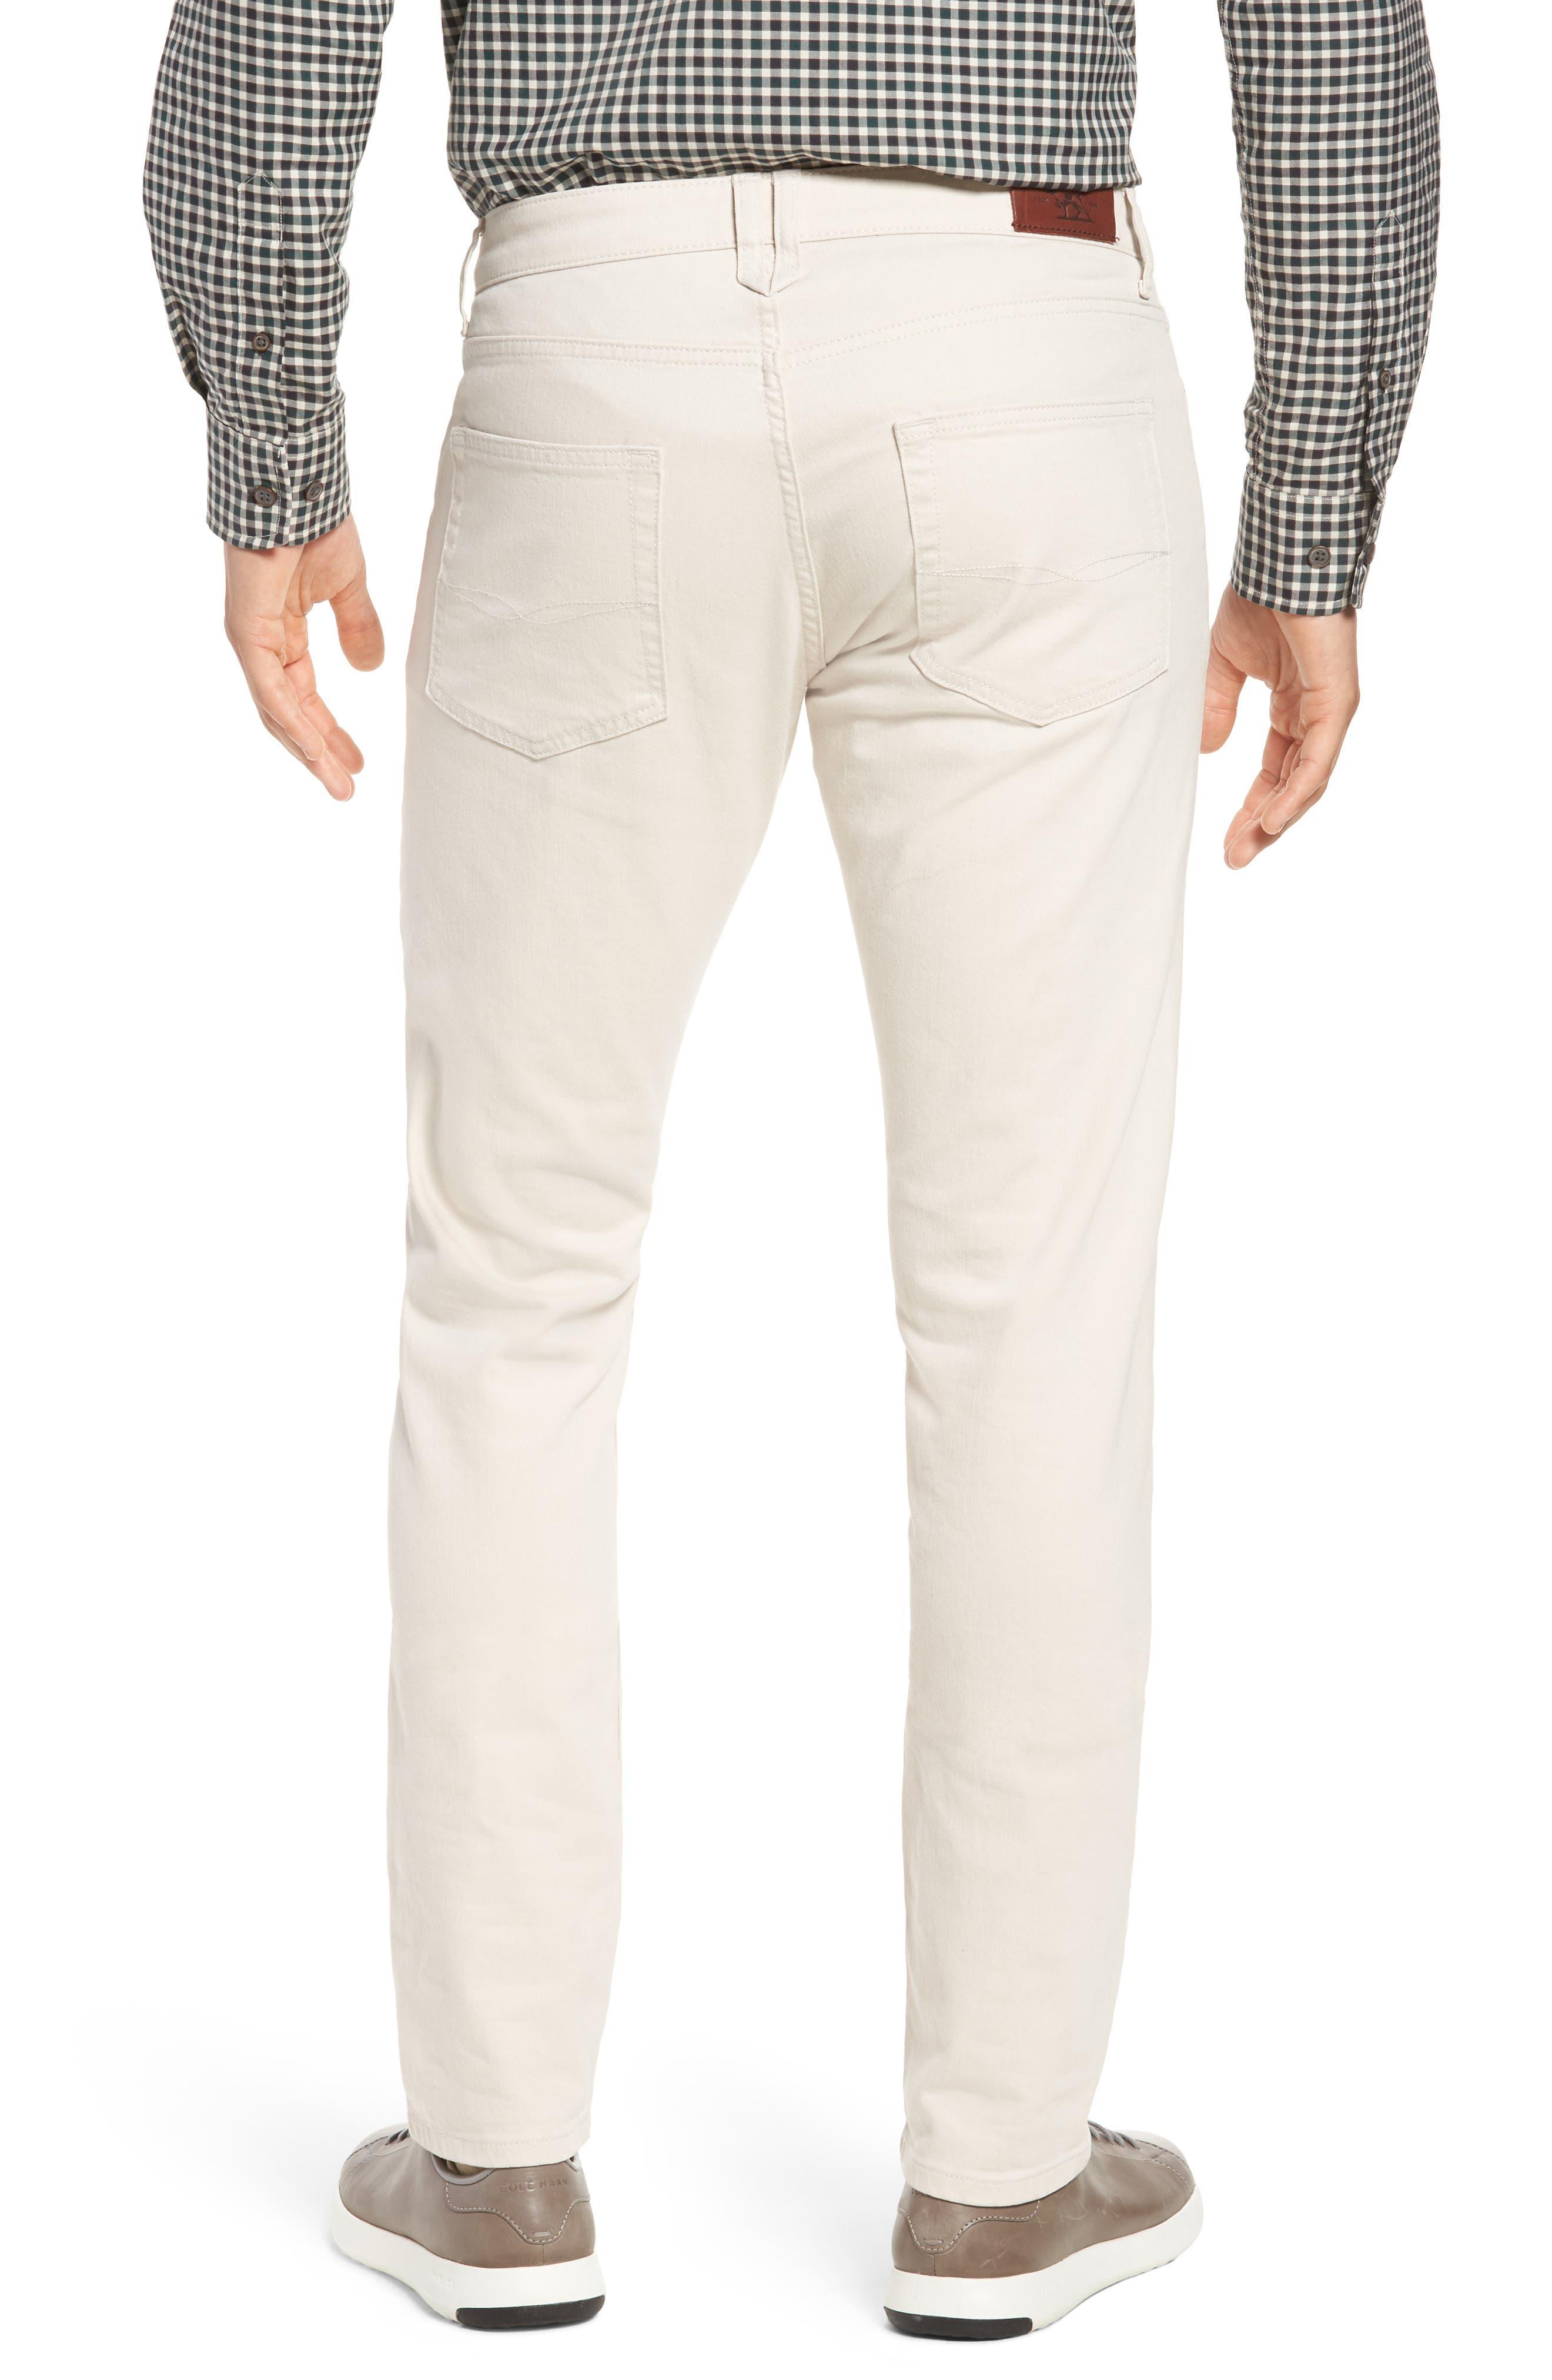 Dartmouth Straight Leg Pants,                             Alternate thumbnail 2, color,                             Pumice